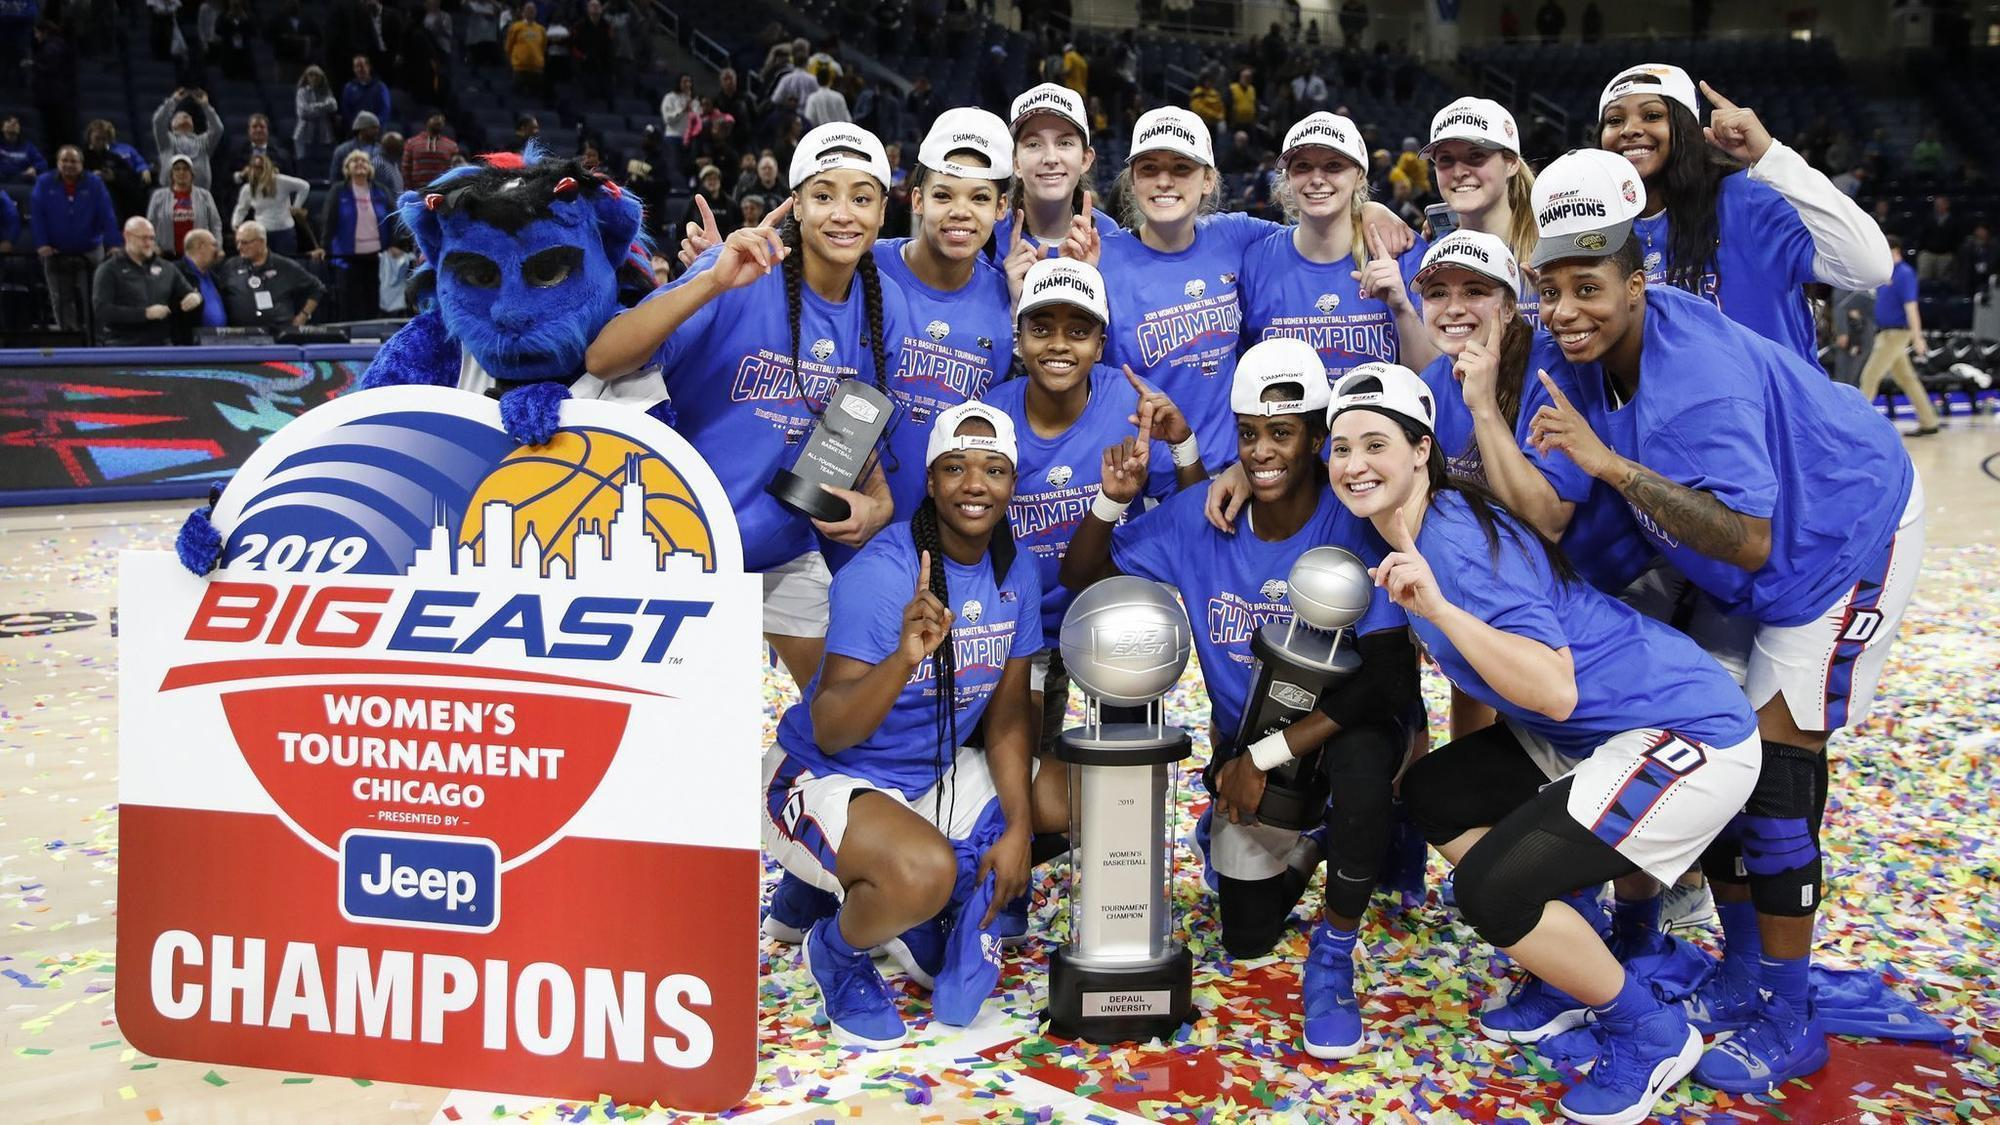 da08acebe6a DePaul women win their 4th Big East Tournament title in 6 years ...